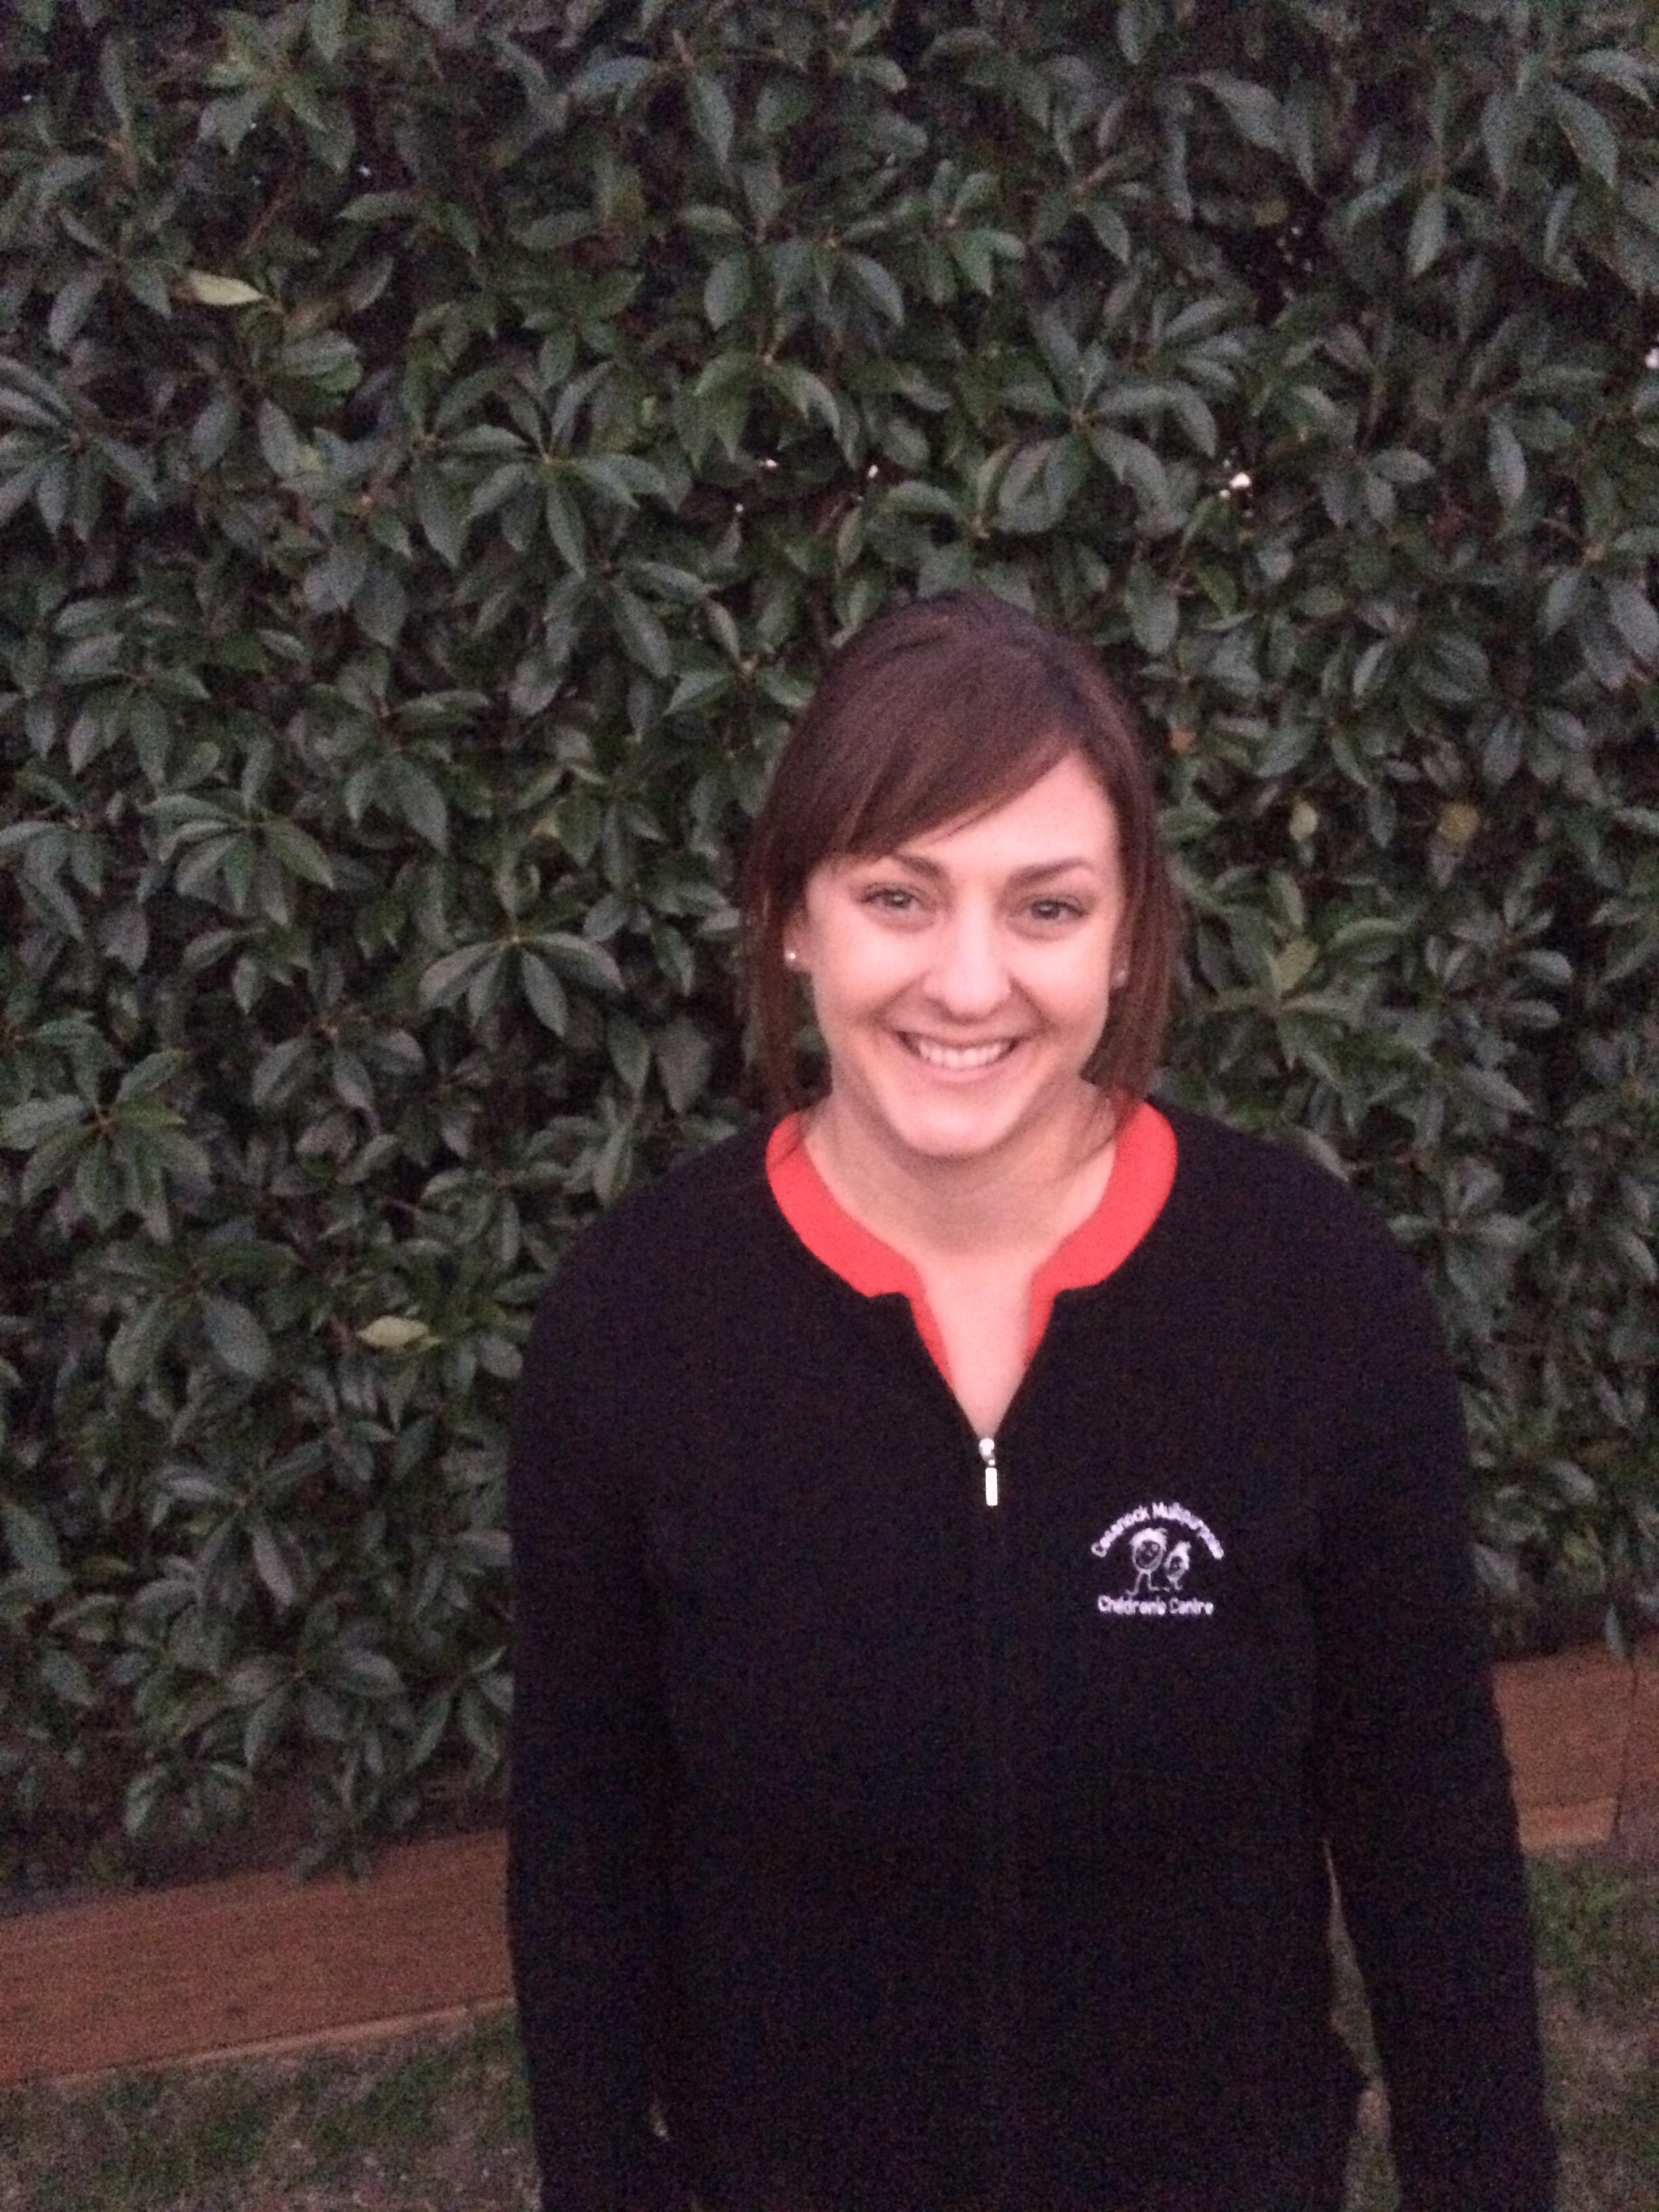 Lauren Evans Picture - Our Team